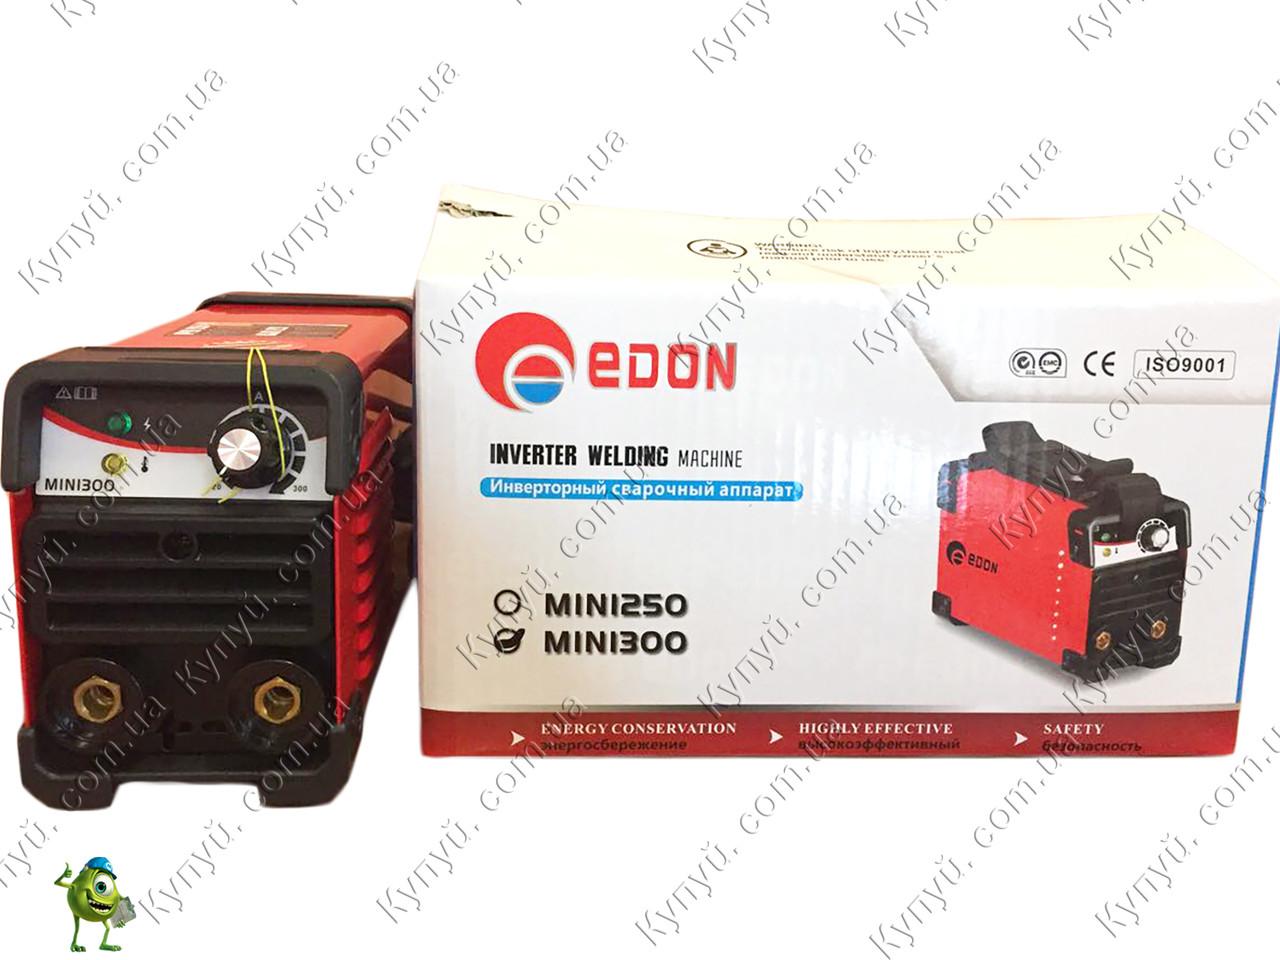 Сварочный инвертор Edon Mini300